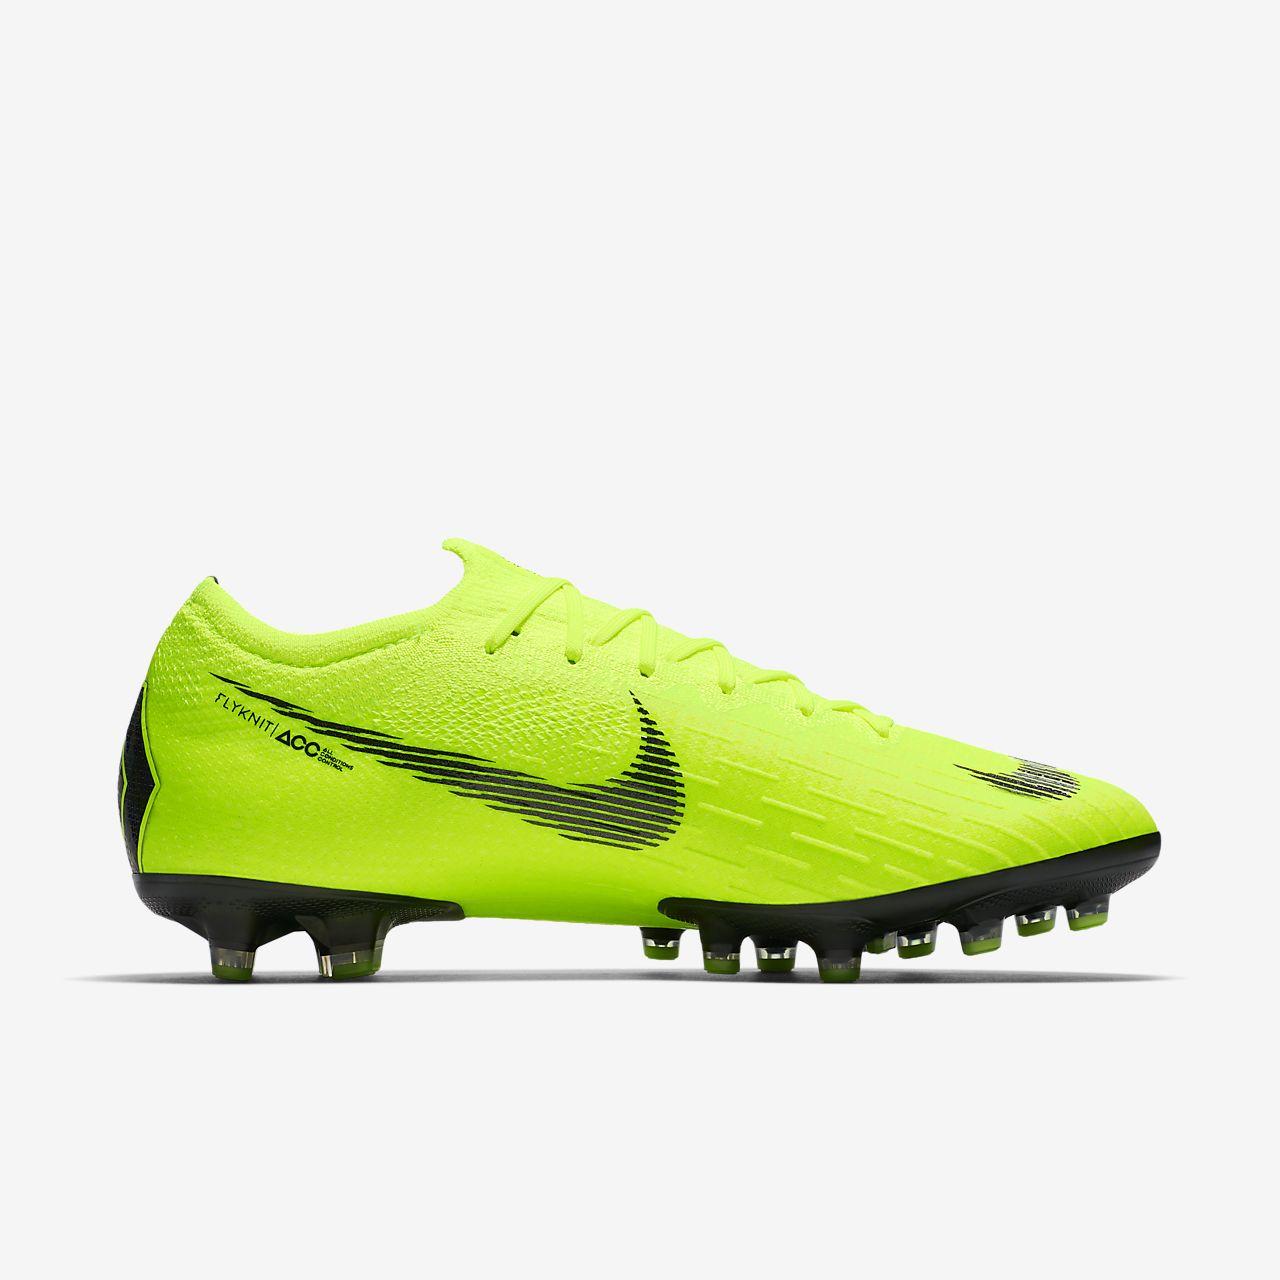 3264c31b550f7 Nike Mercurial Vapor 360 Elite AG-PRO Artificial-Grass Football Boot ...